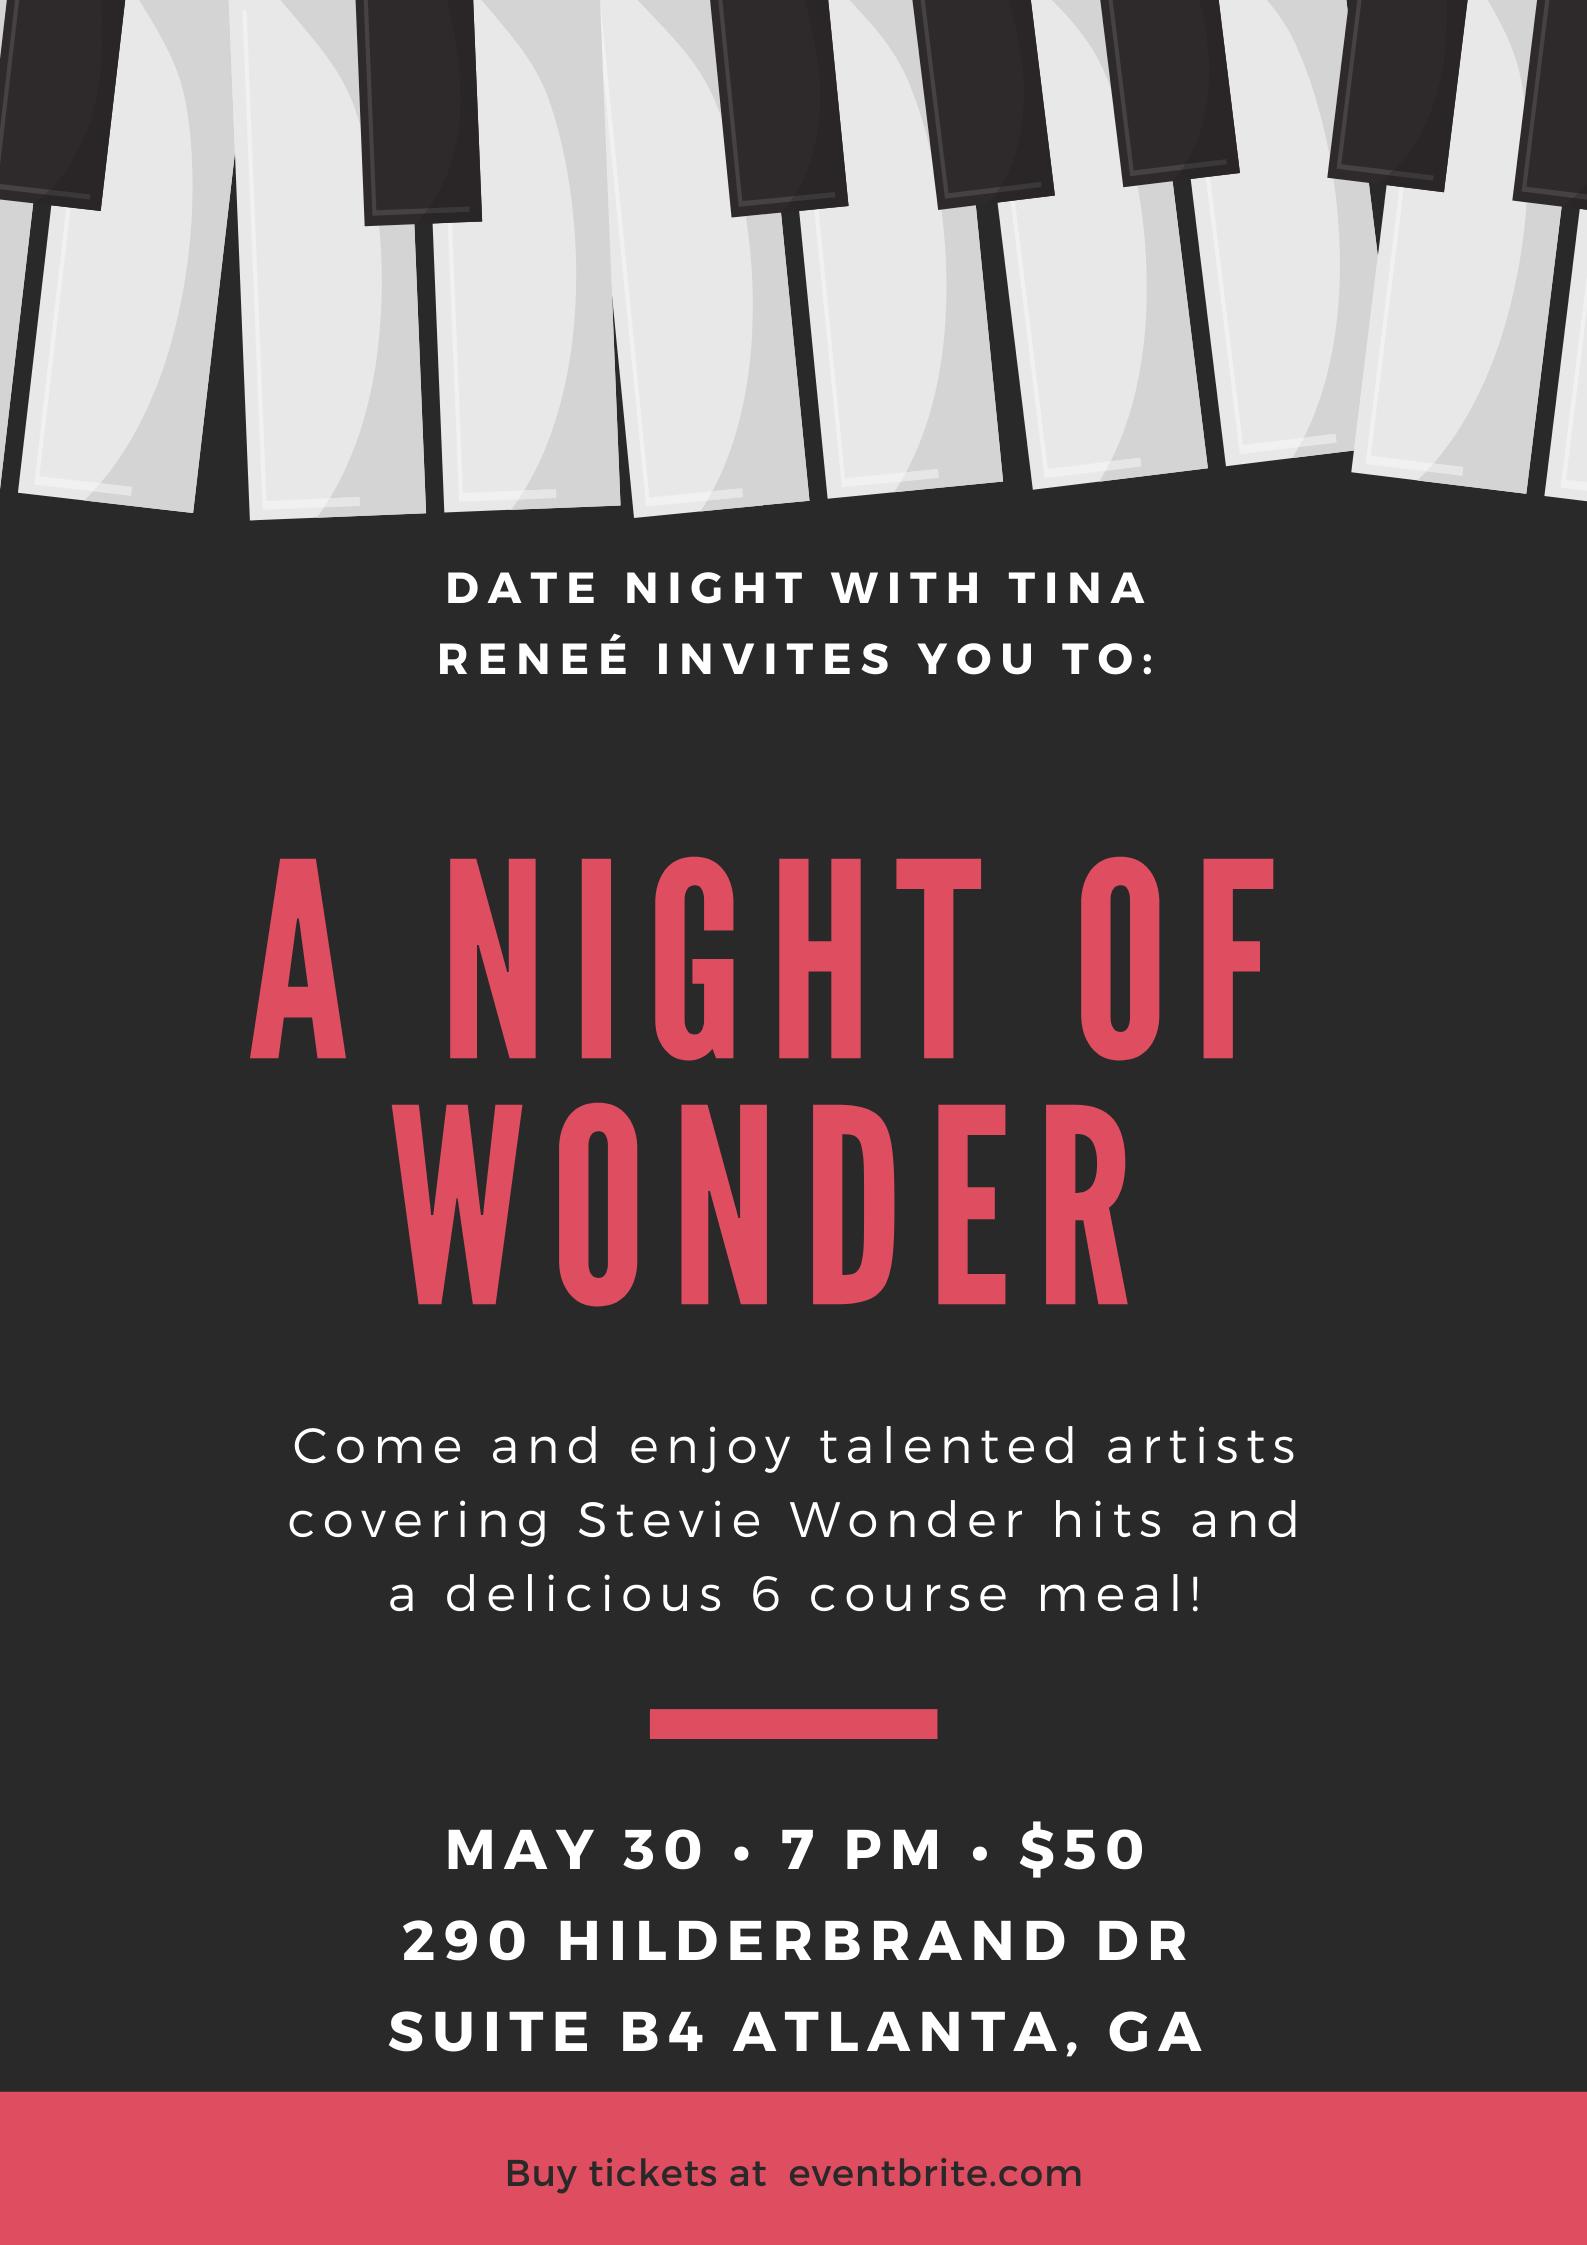 A Night of Wonder